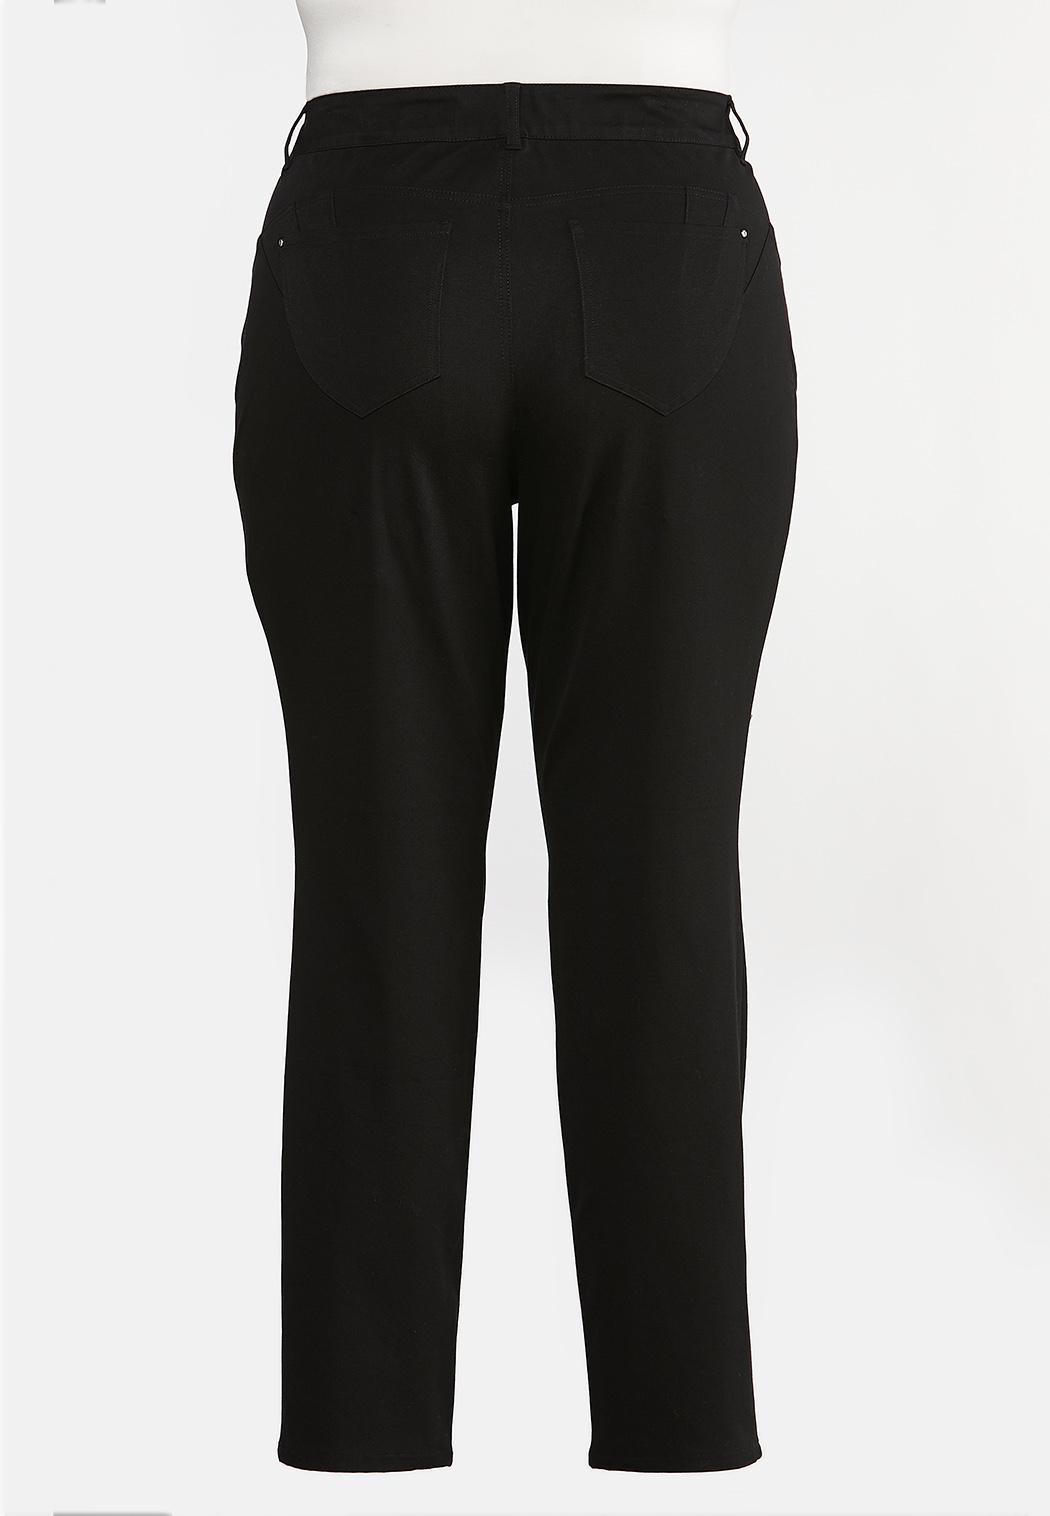 Plus Petite Curvy Getaway Pants (Item #44375123)